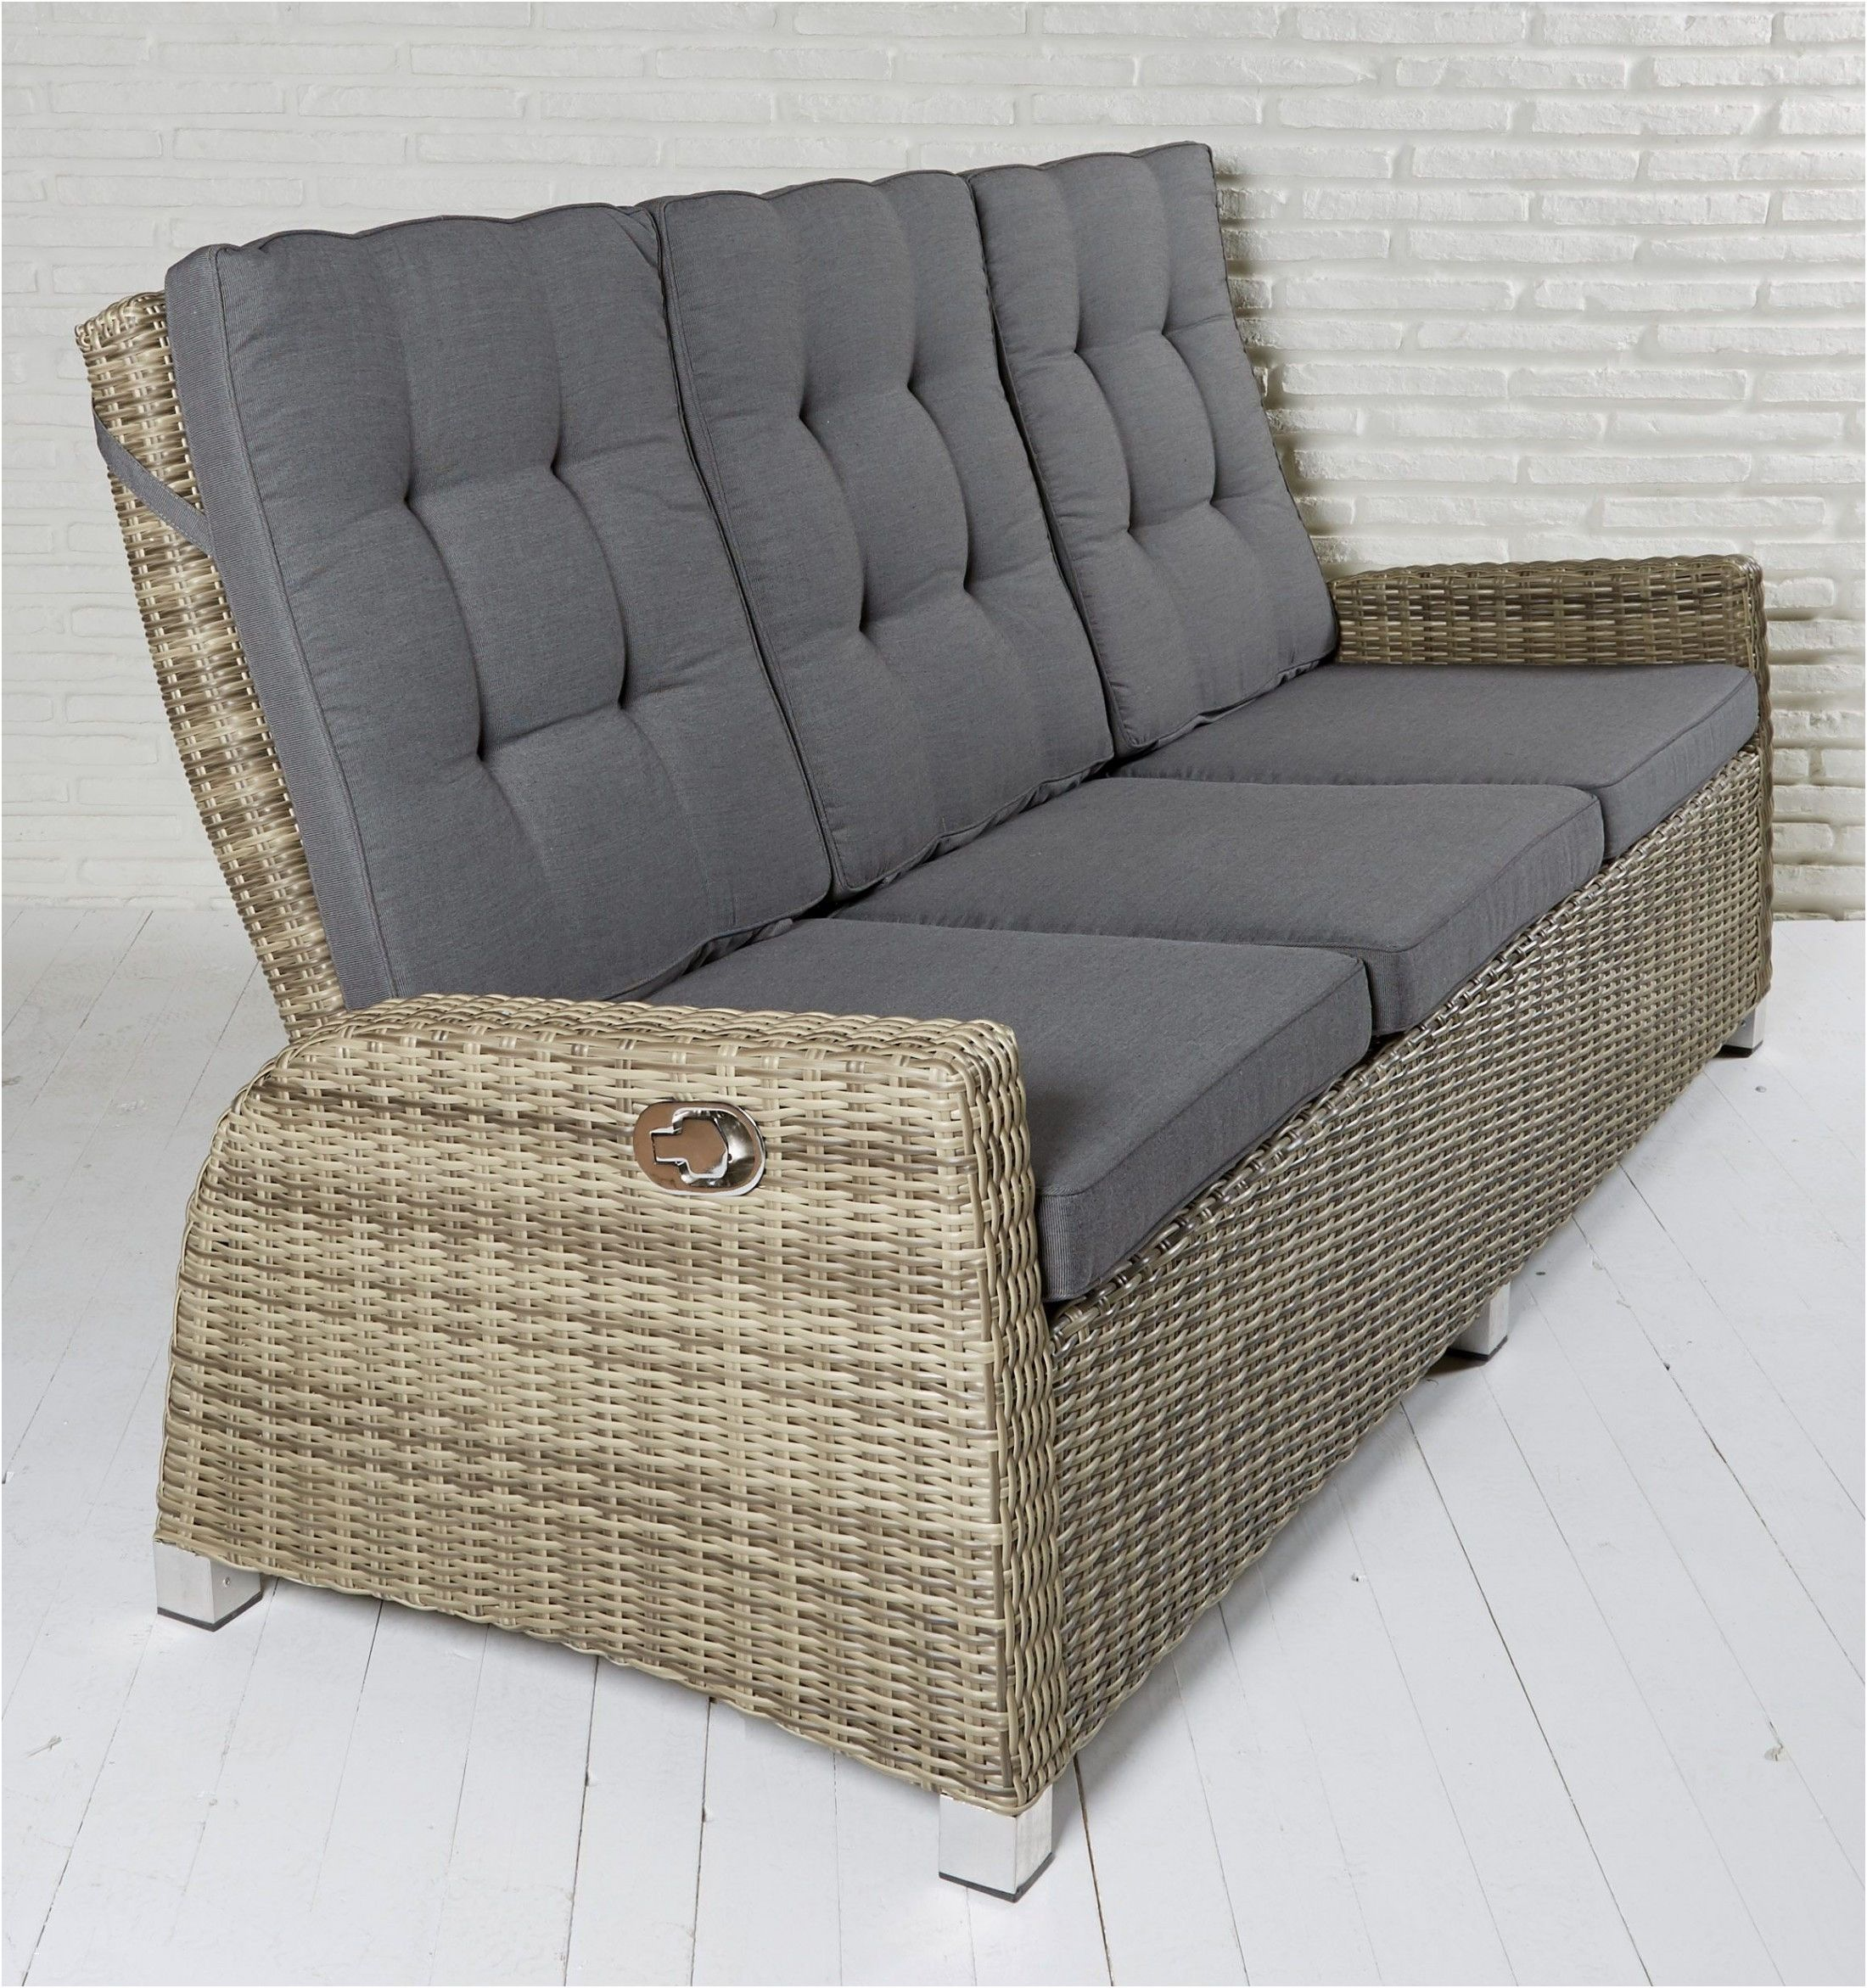 Interessant Ecksofa Verstellbar Couch Mobel